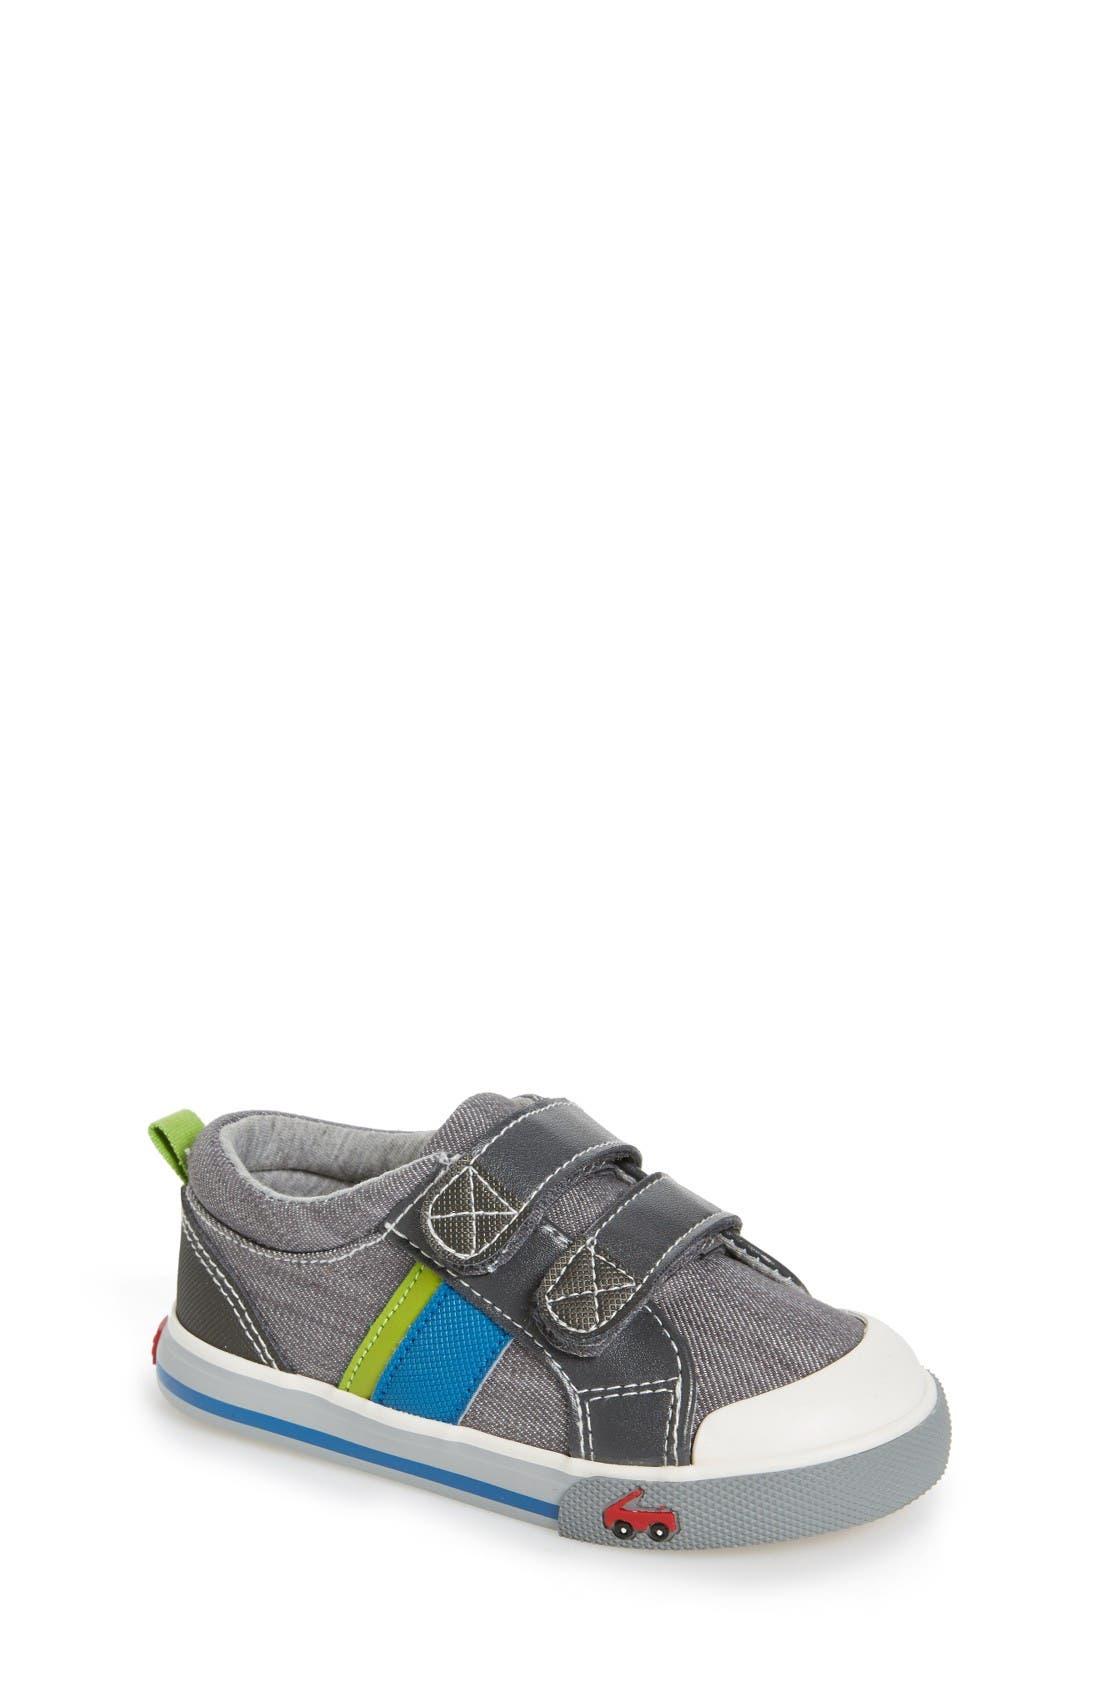 Alternate Image 1 Selected - See Kai Run 'Russell' Sneaker (Baby, Walker & Toddler)